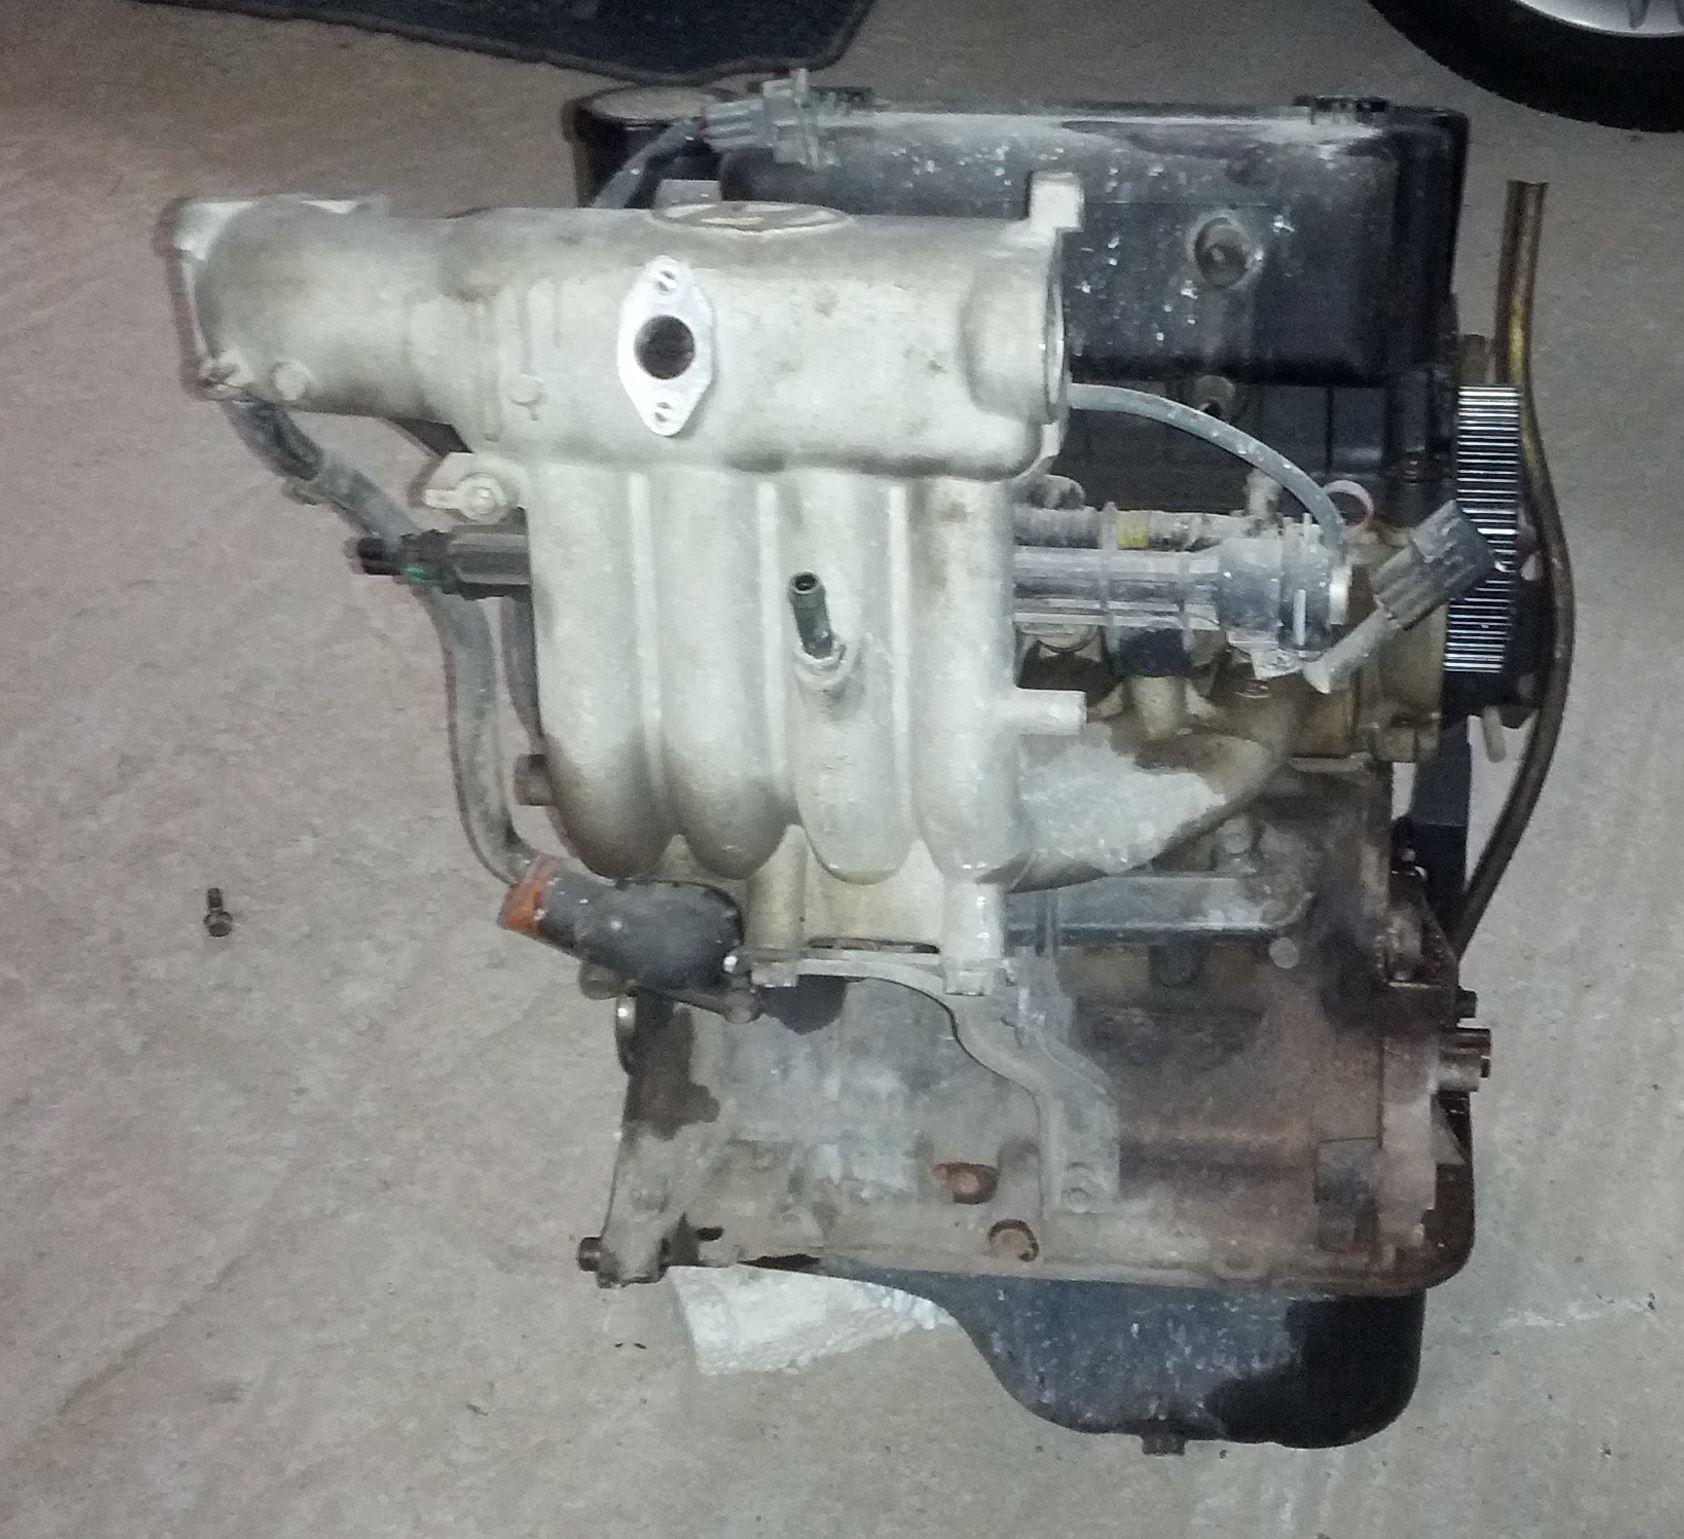 hight resolution of hyundai atos engine teardown part 1 fubar gr hyundai atos engine diagram